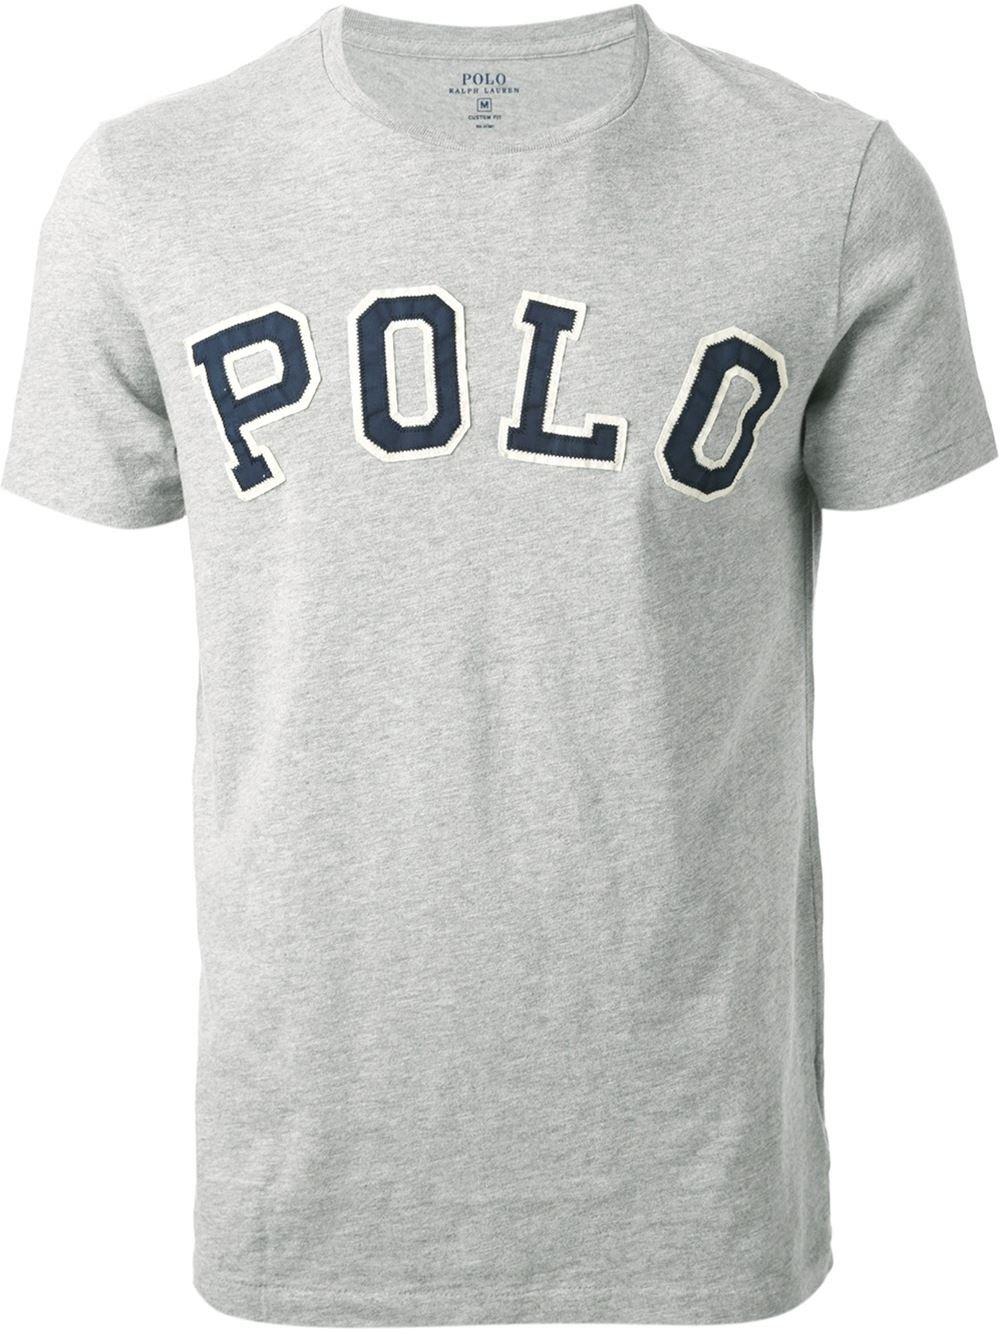 polo ralph lauren logo appliqu t shirt in gray for men